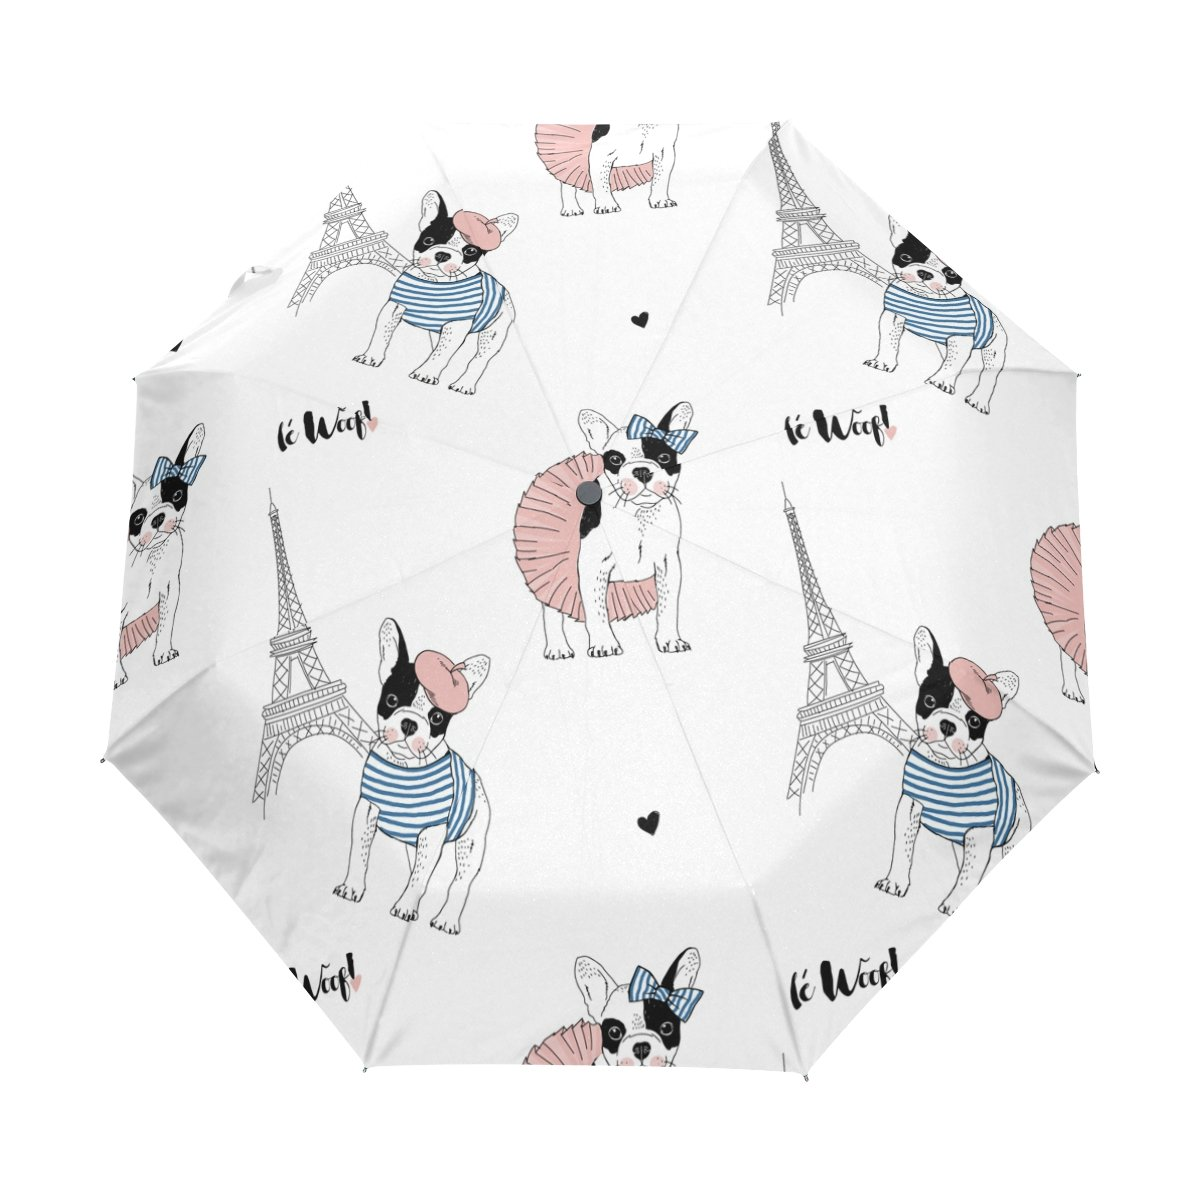 lavovoフレンチブルドッグパリエッフェル塔傘両面キャノピー自動開く閉じる折りたたみ式旅行雨傘 B0756SVKKF